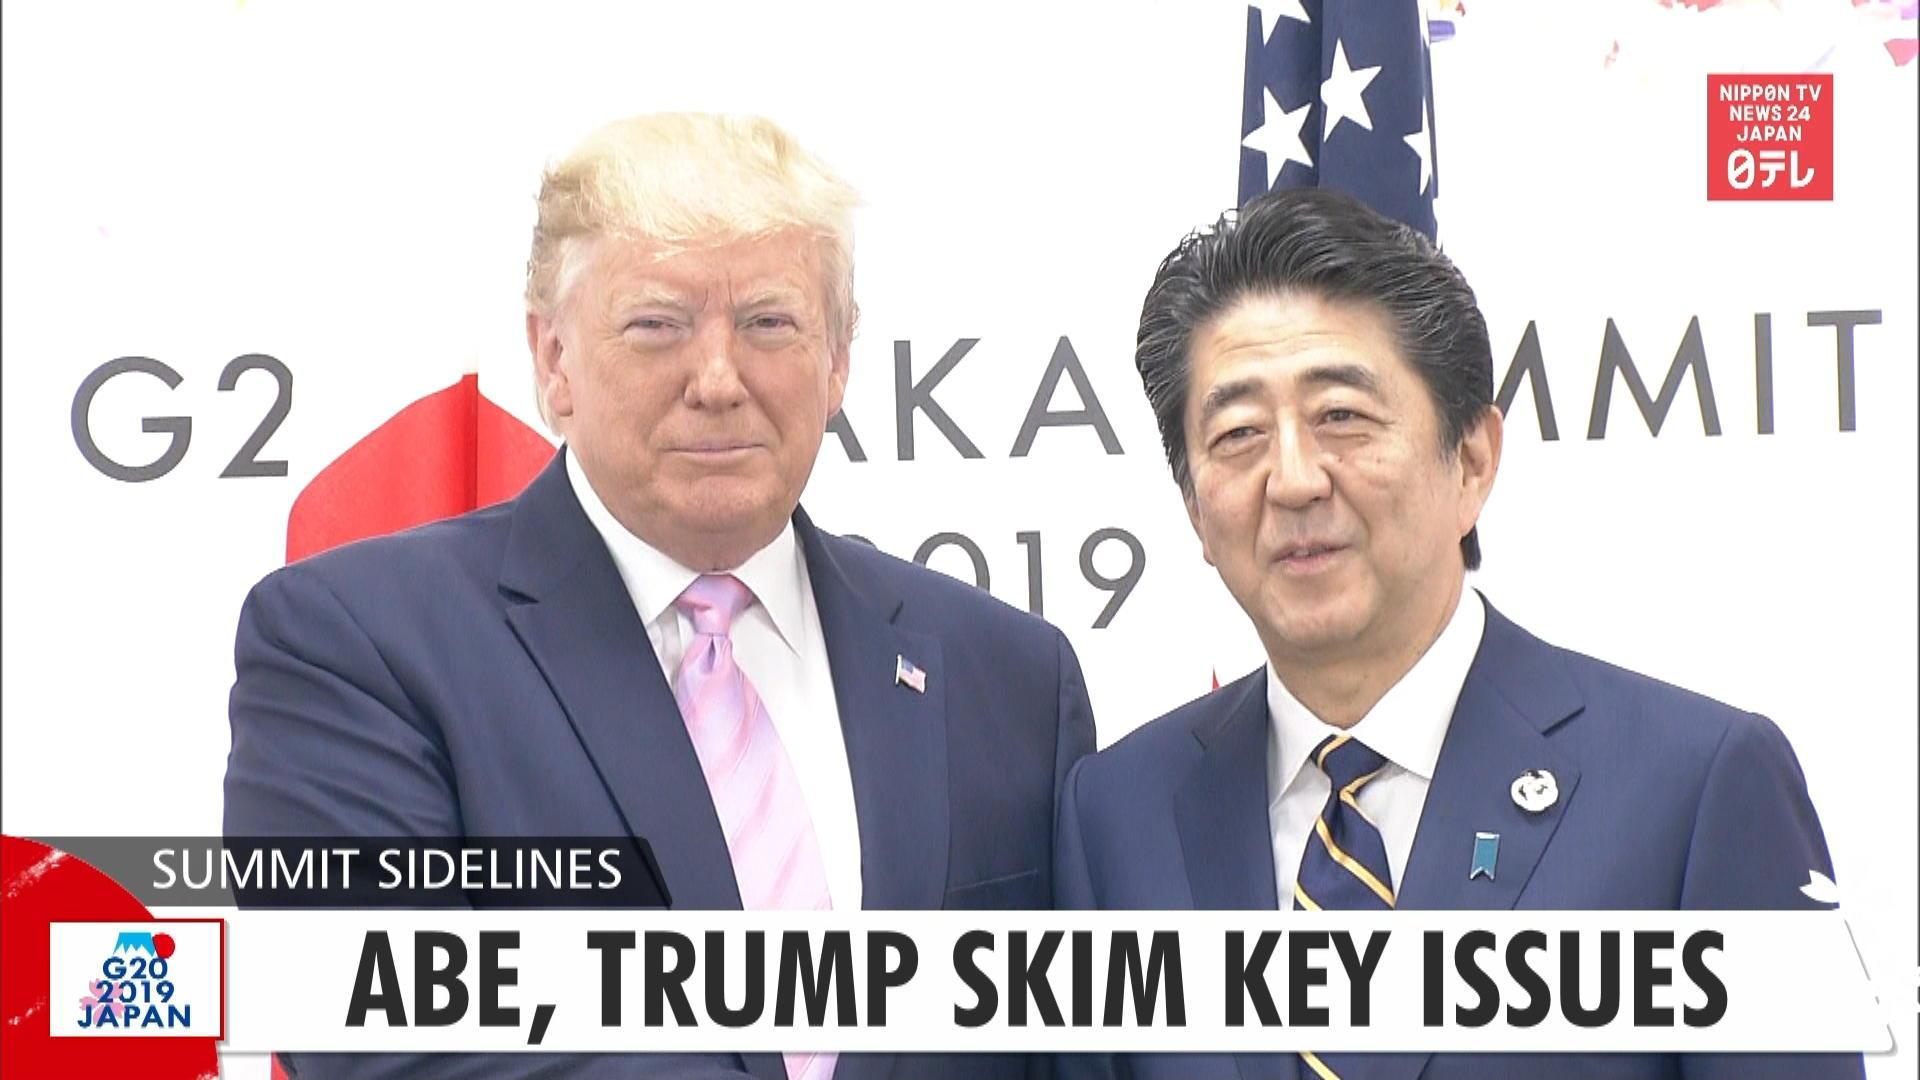 G20: Abe, Trump skim key issues